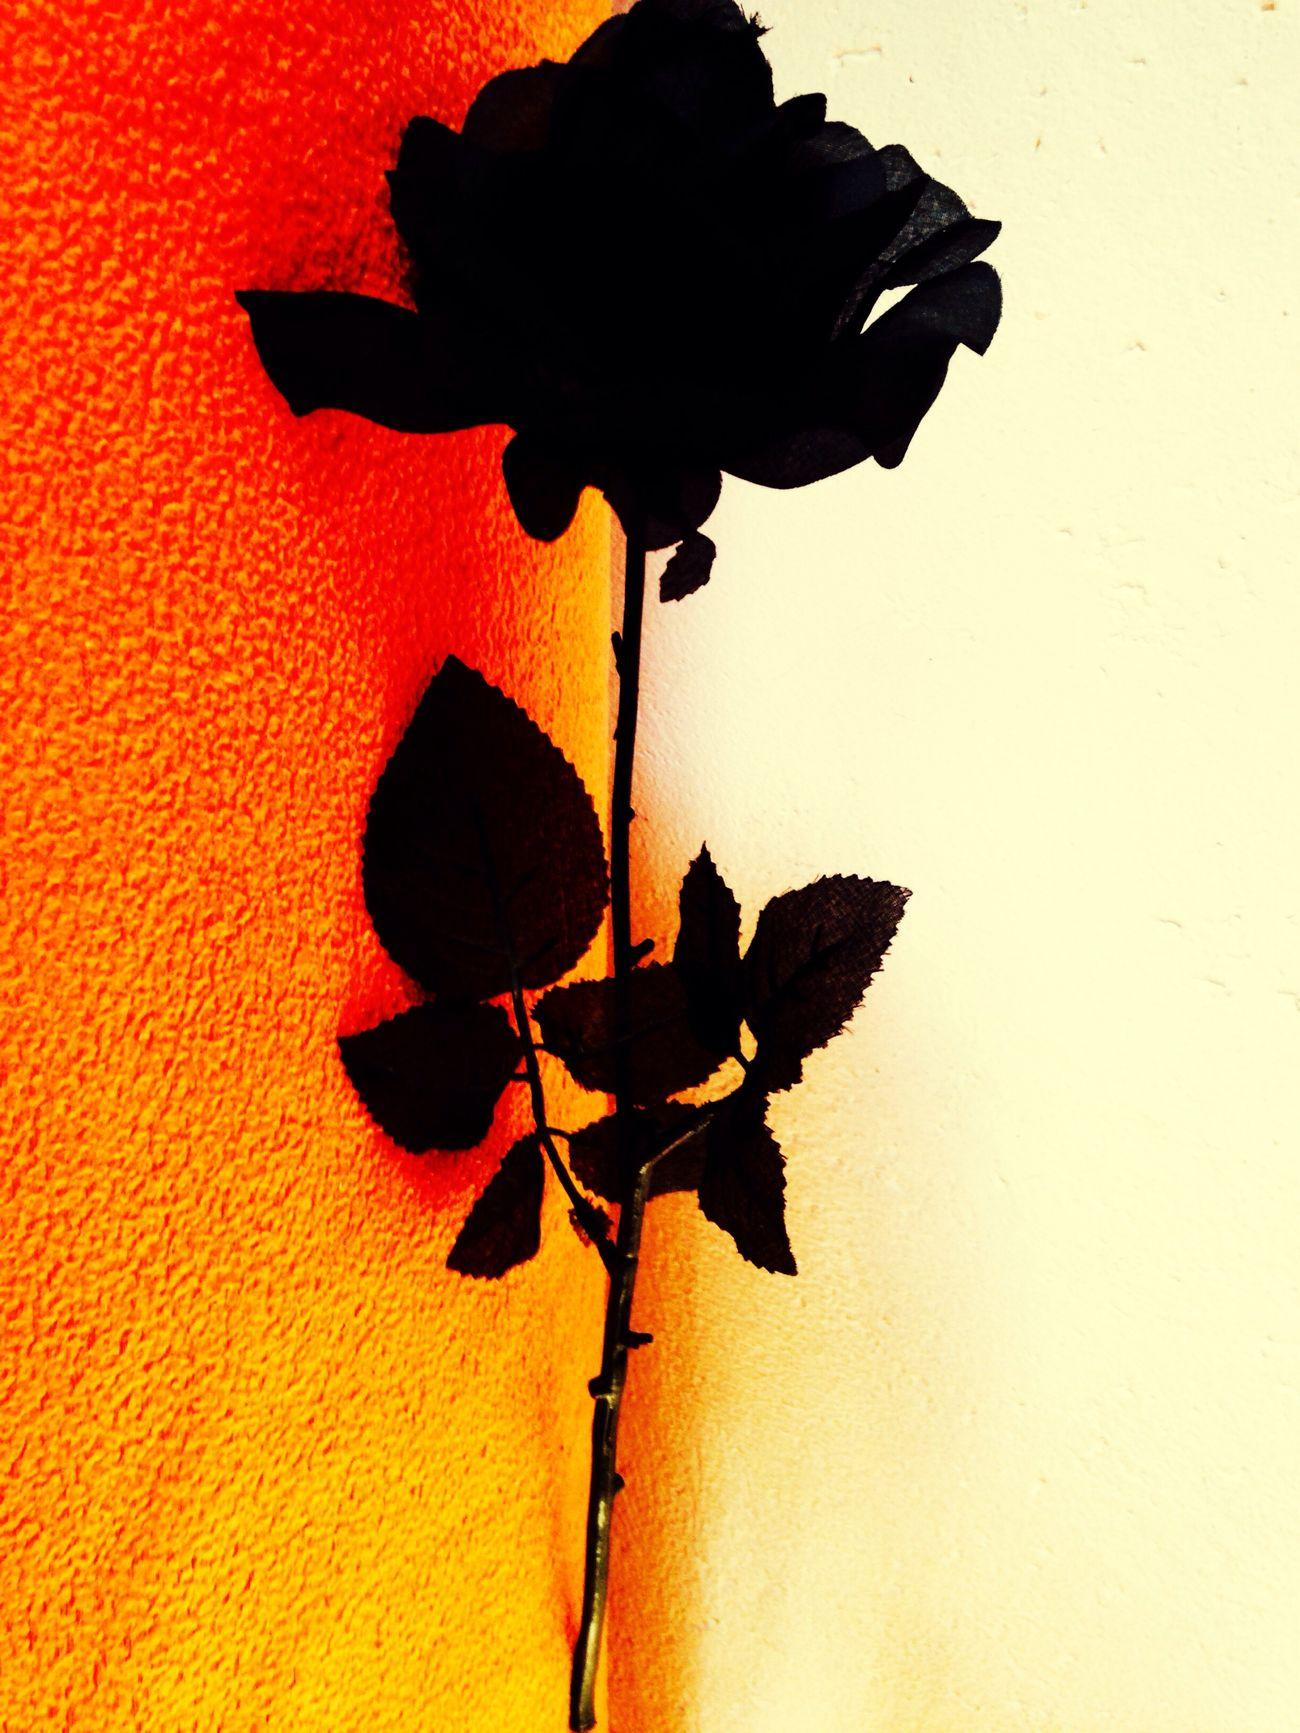 Flower Rose - Flower No People Black And Orange (: Colors Roses Roses🌹